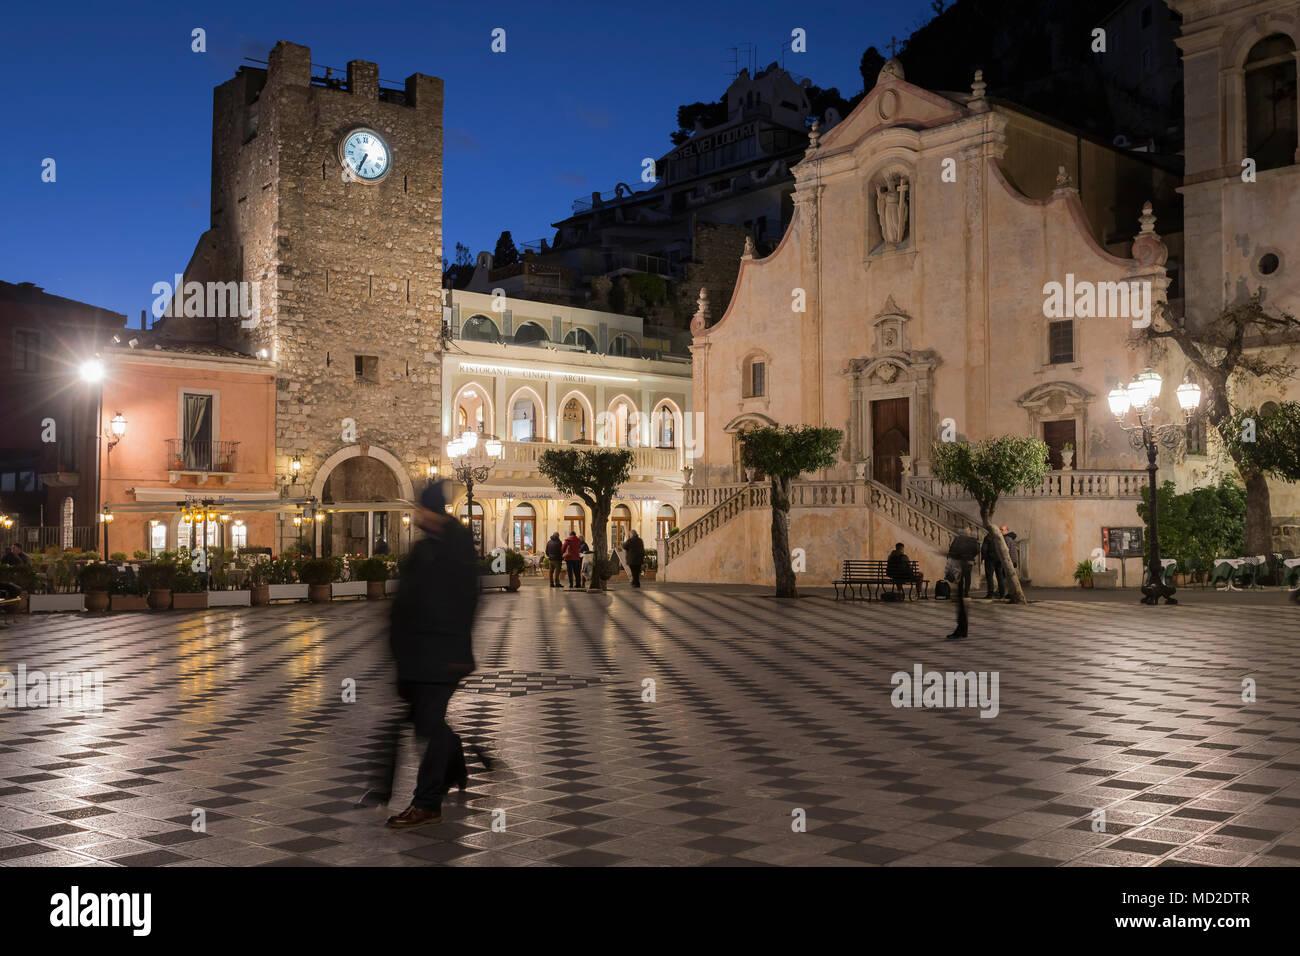 Piazza IX Aprile square, San Giuseppe church and Clock Tower in Taormina, Sicily. - Stock Image